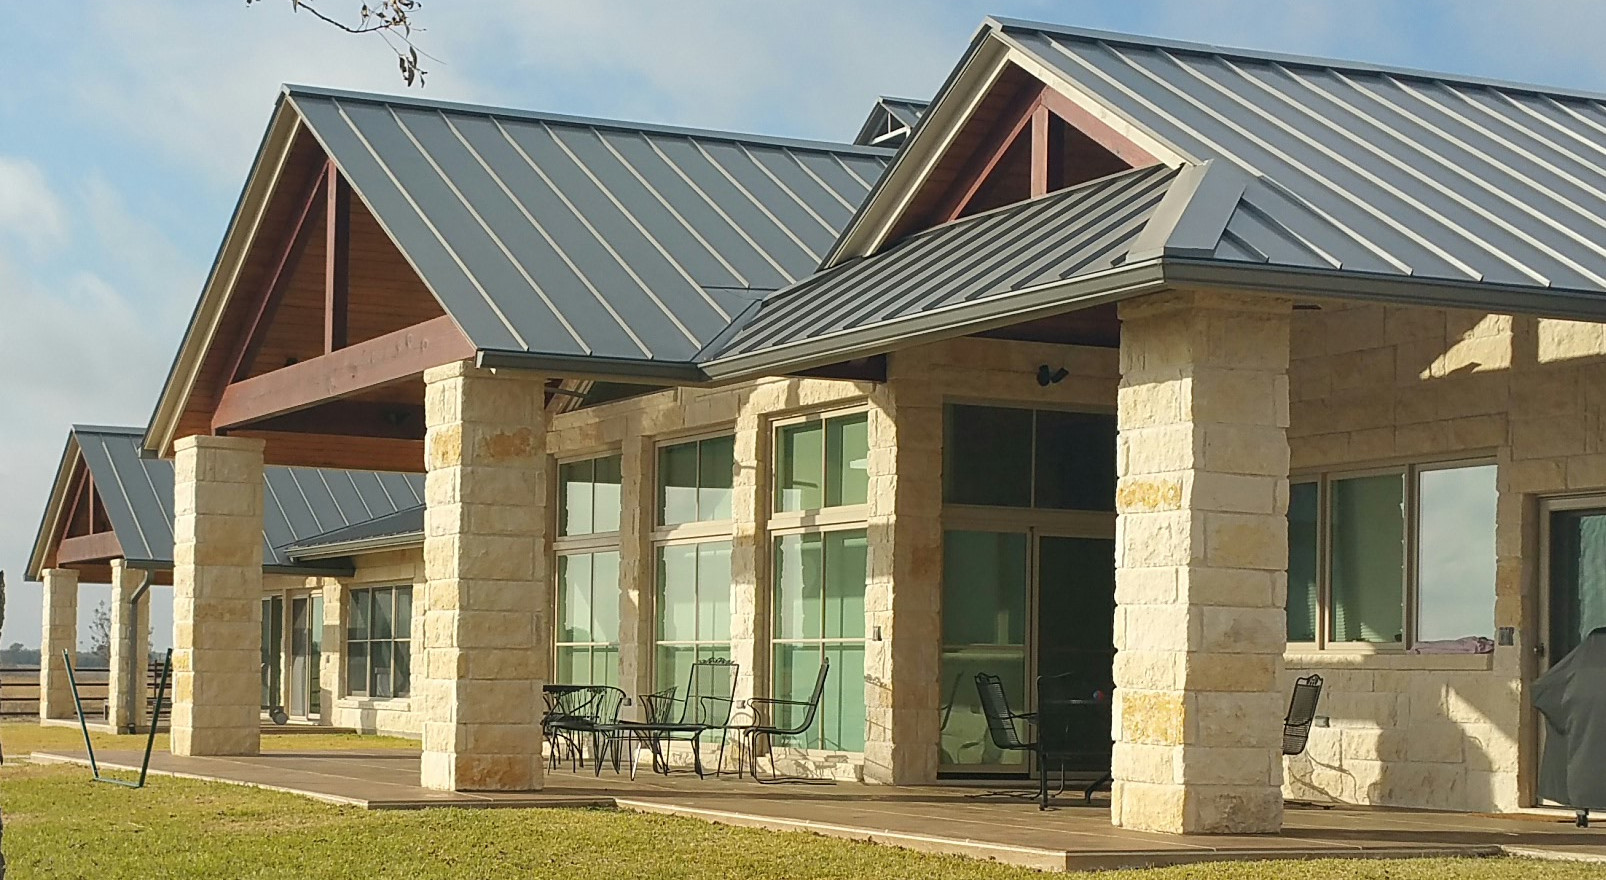 JPY House, Navasota,TX